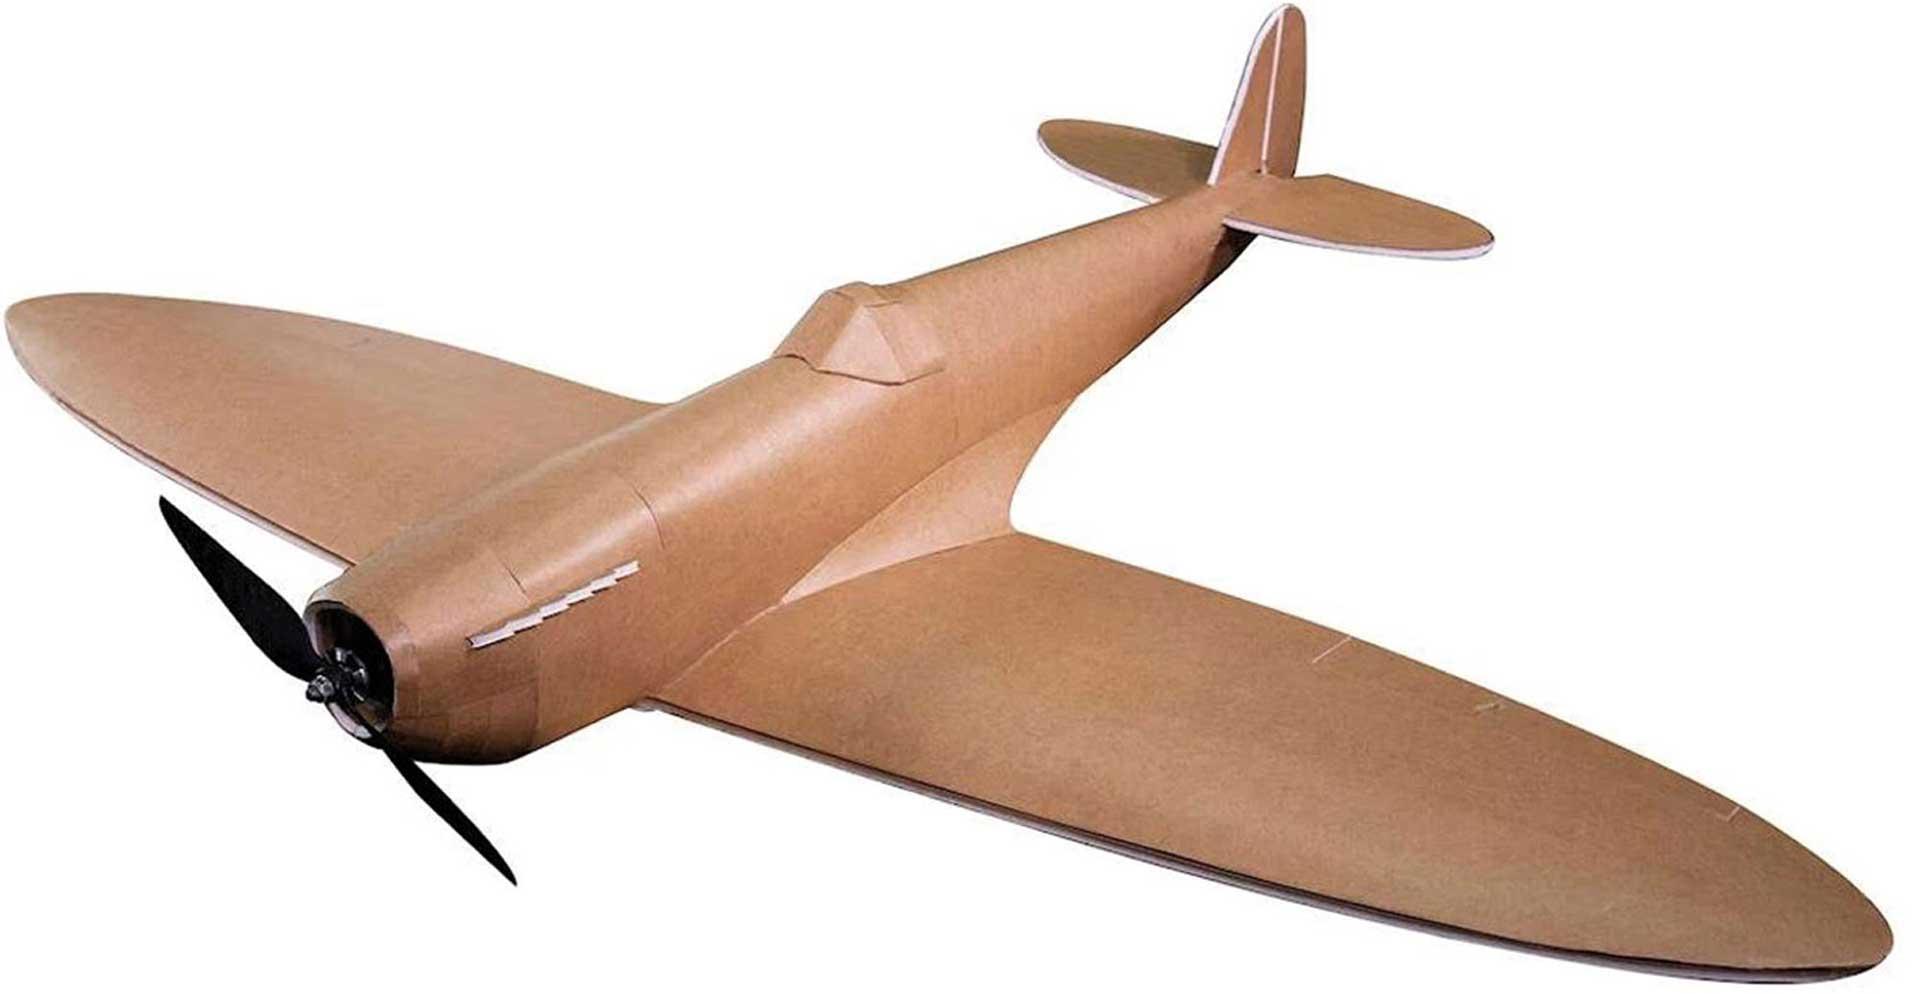 Flite Test Master Series Spitfire